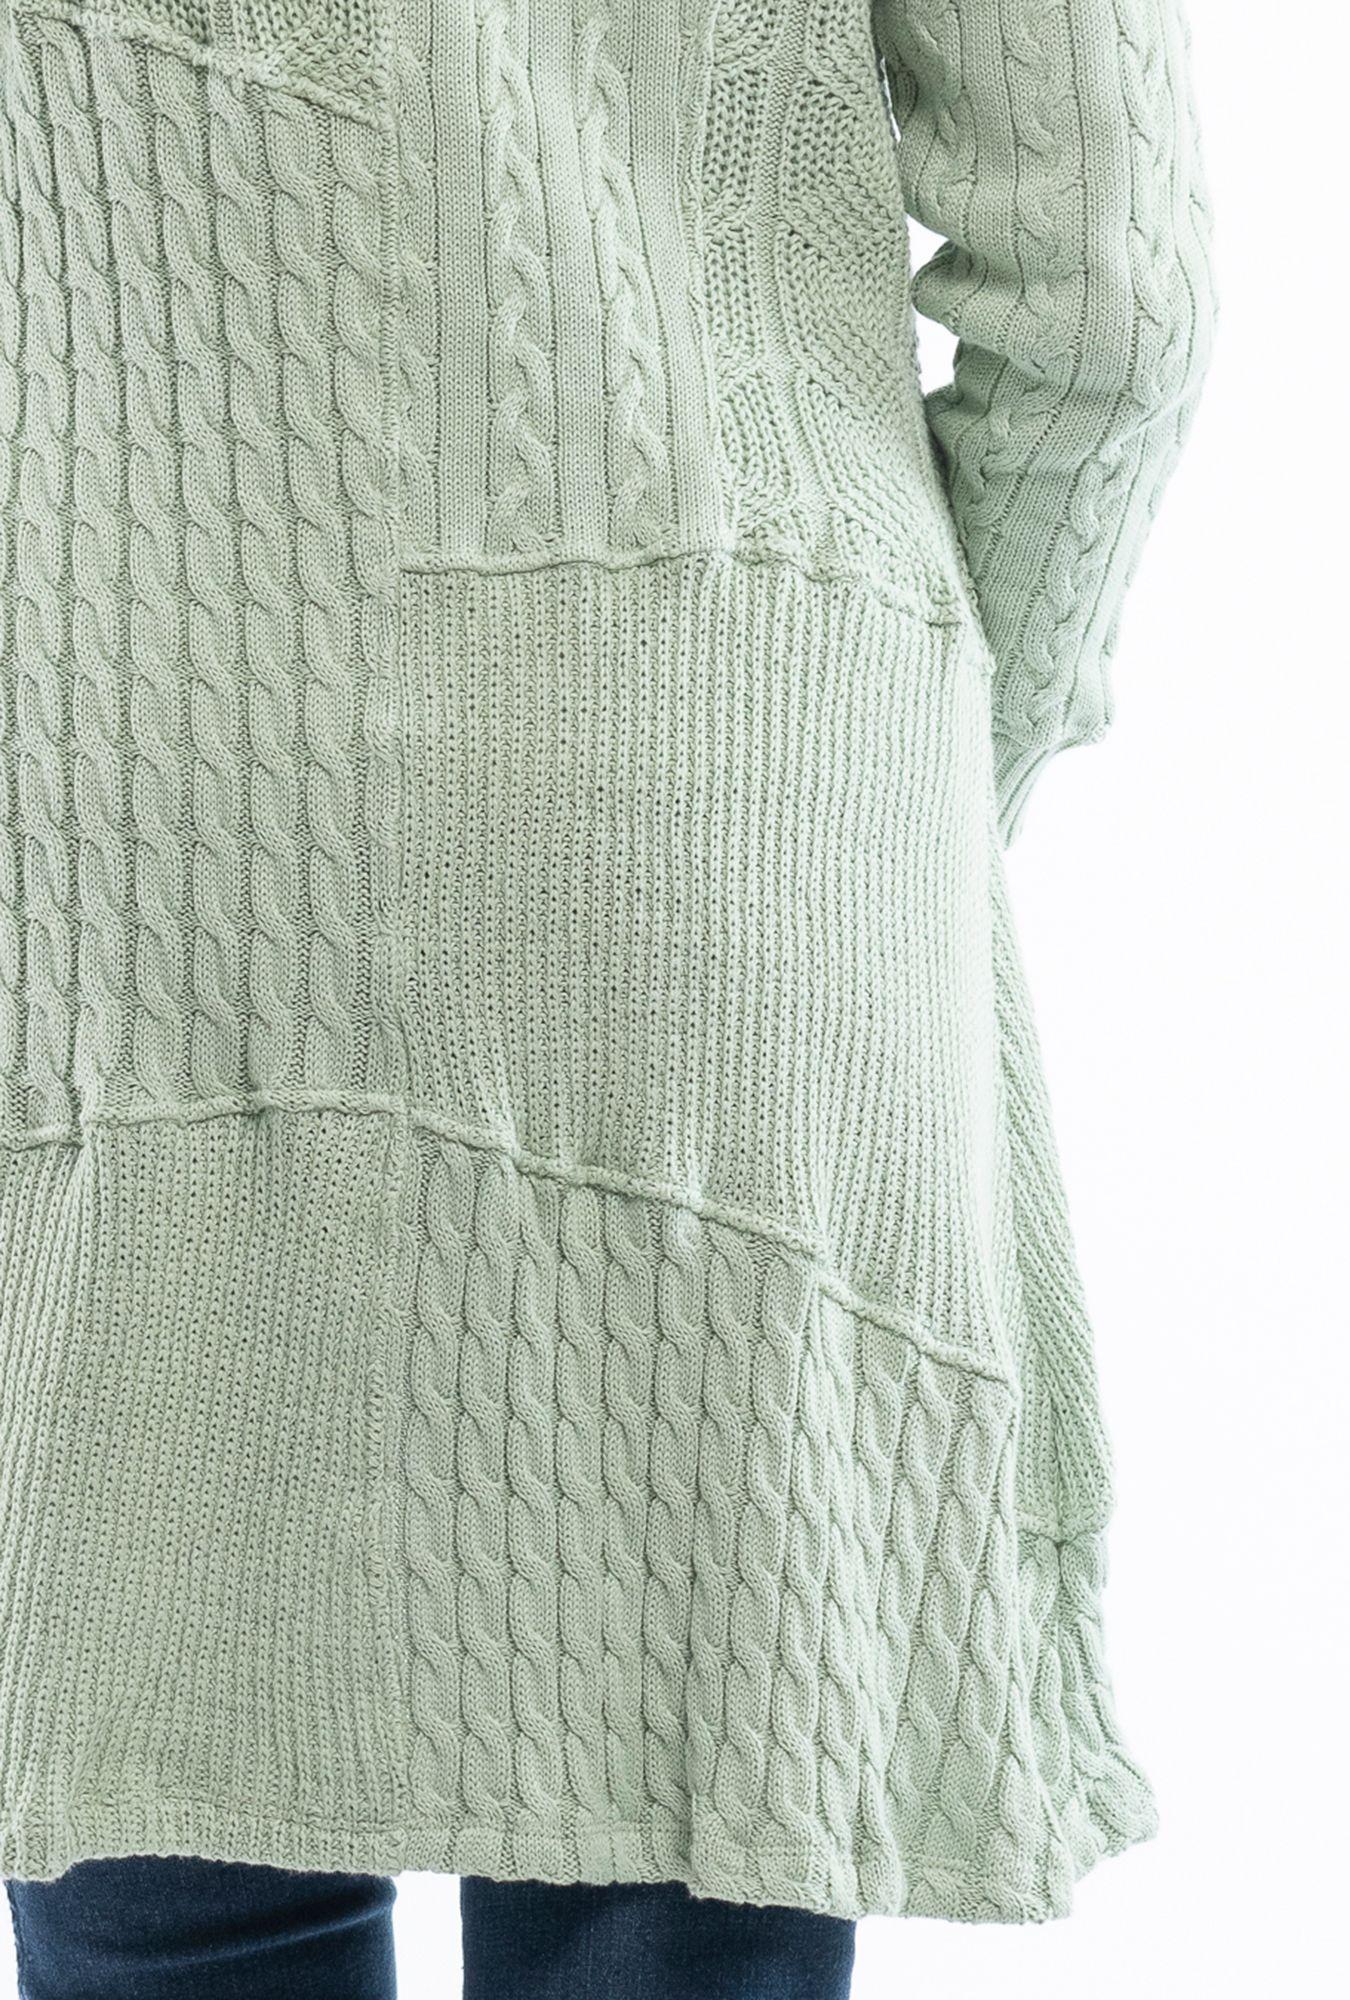 Moss Stone Coat